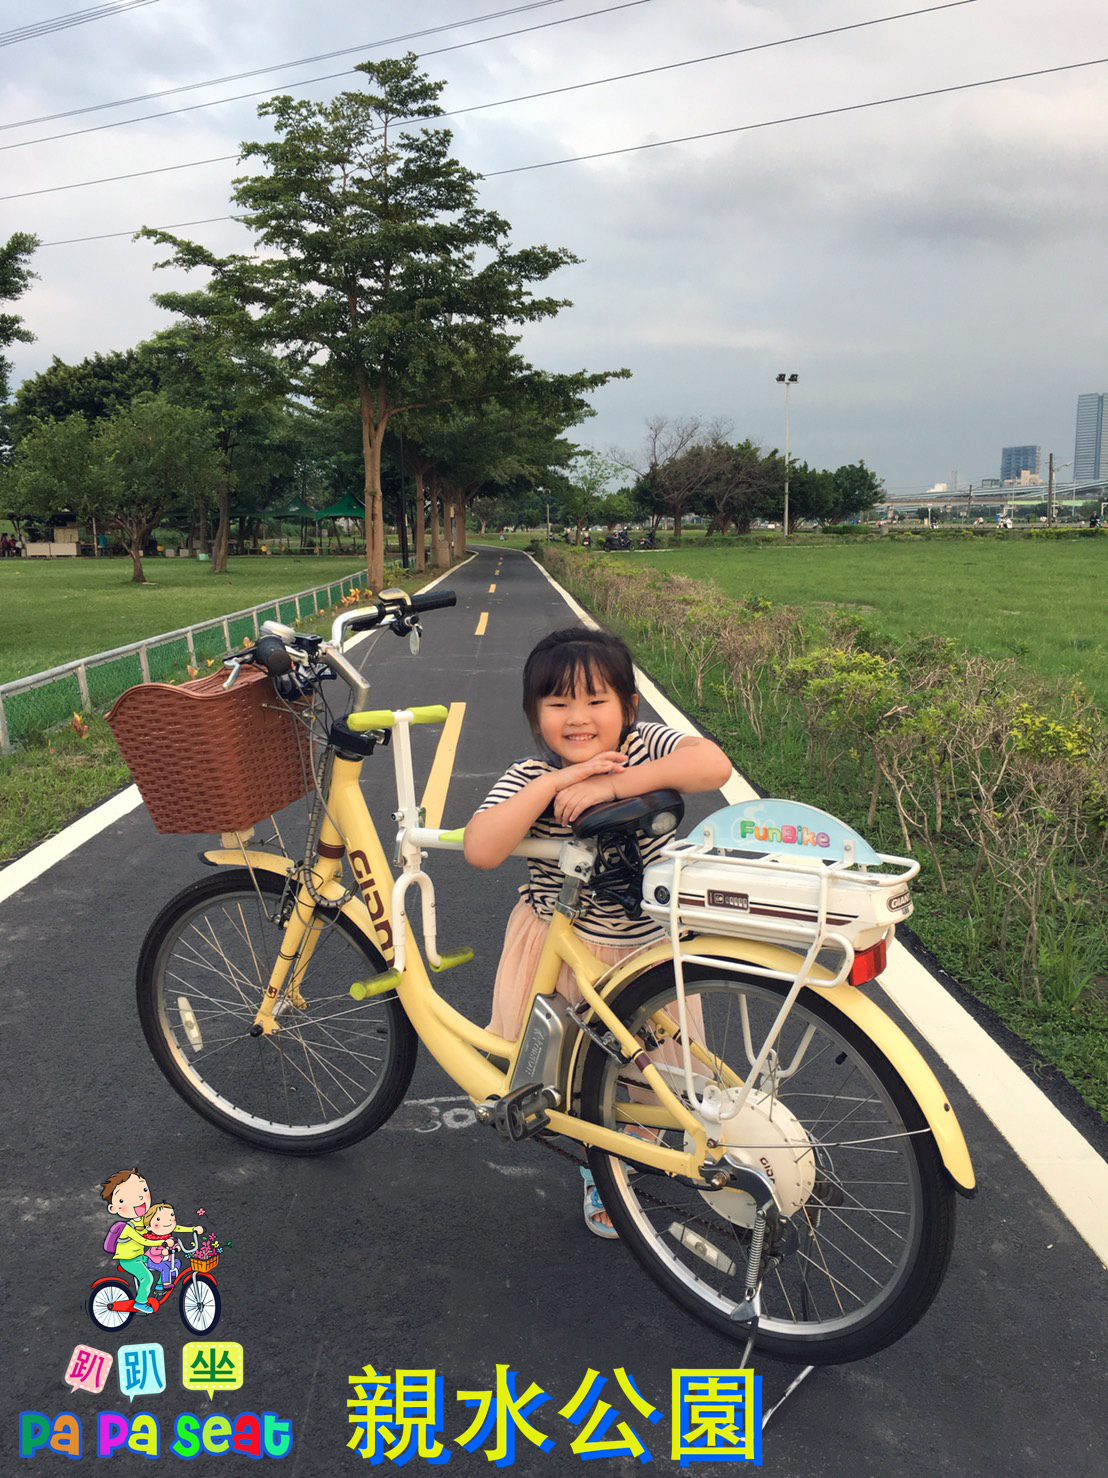 親子公園 - Sept 2017 - 2